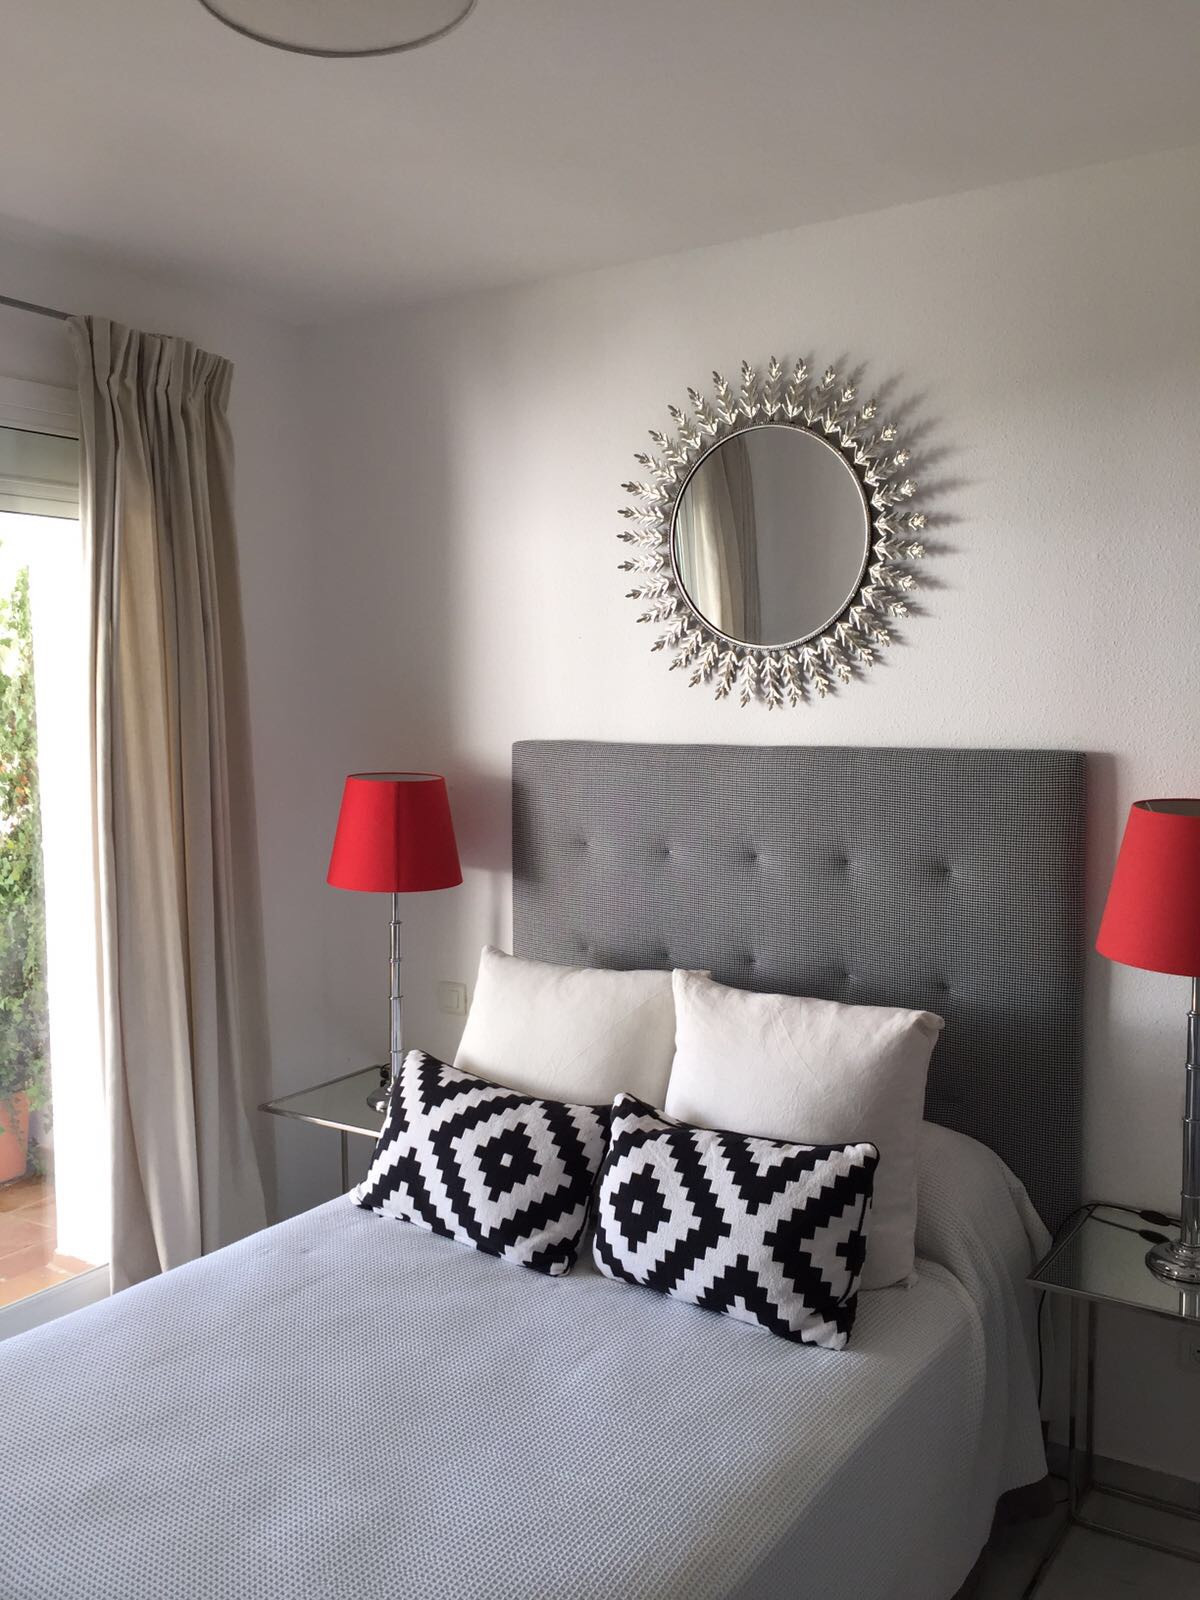 Fantastic ground floor apartment with private garden. Reformed. It has 2 bedrooms, 2 bathrooms, livi,Spain